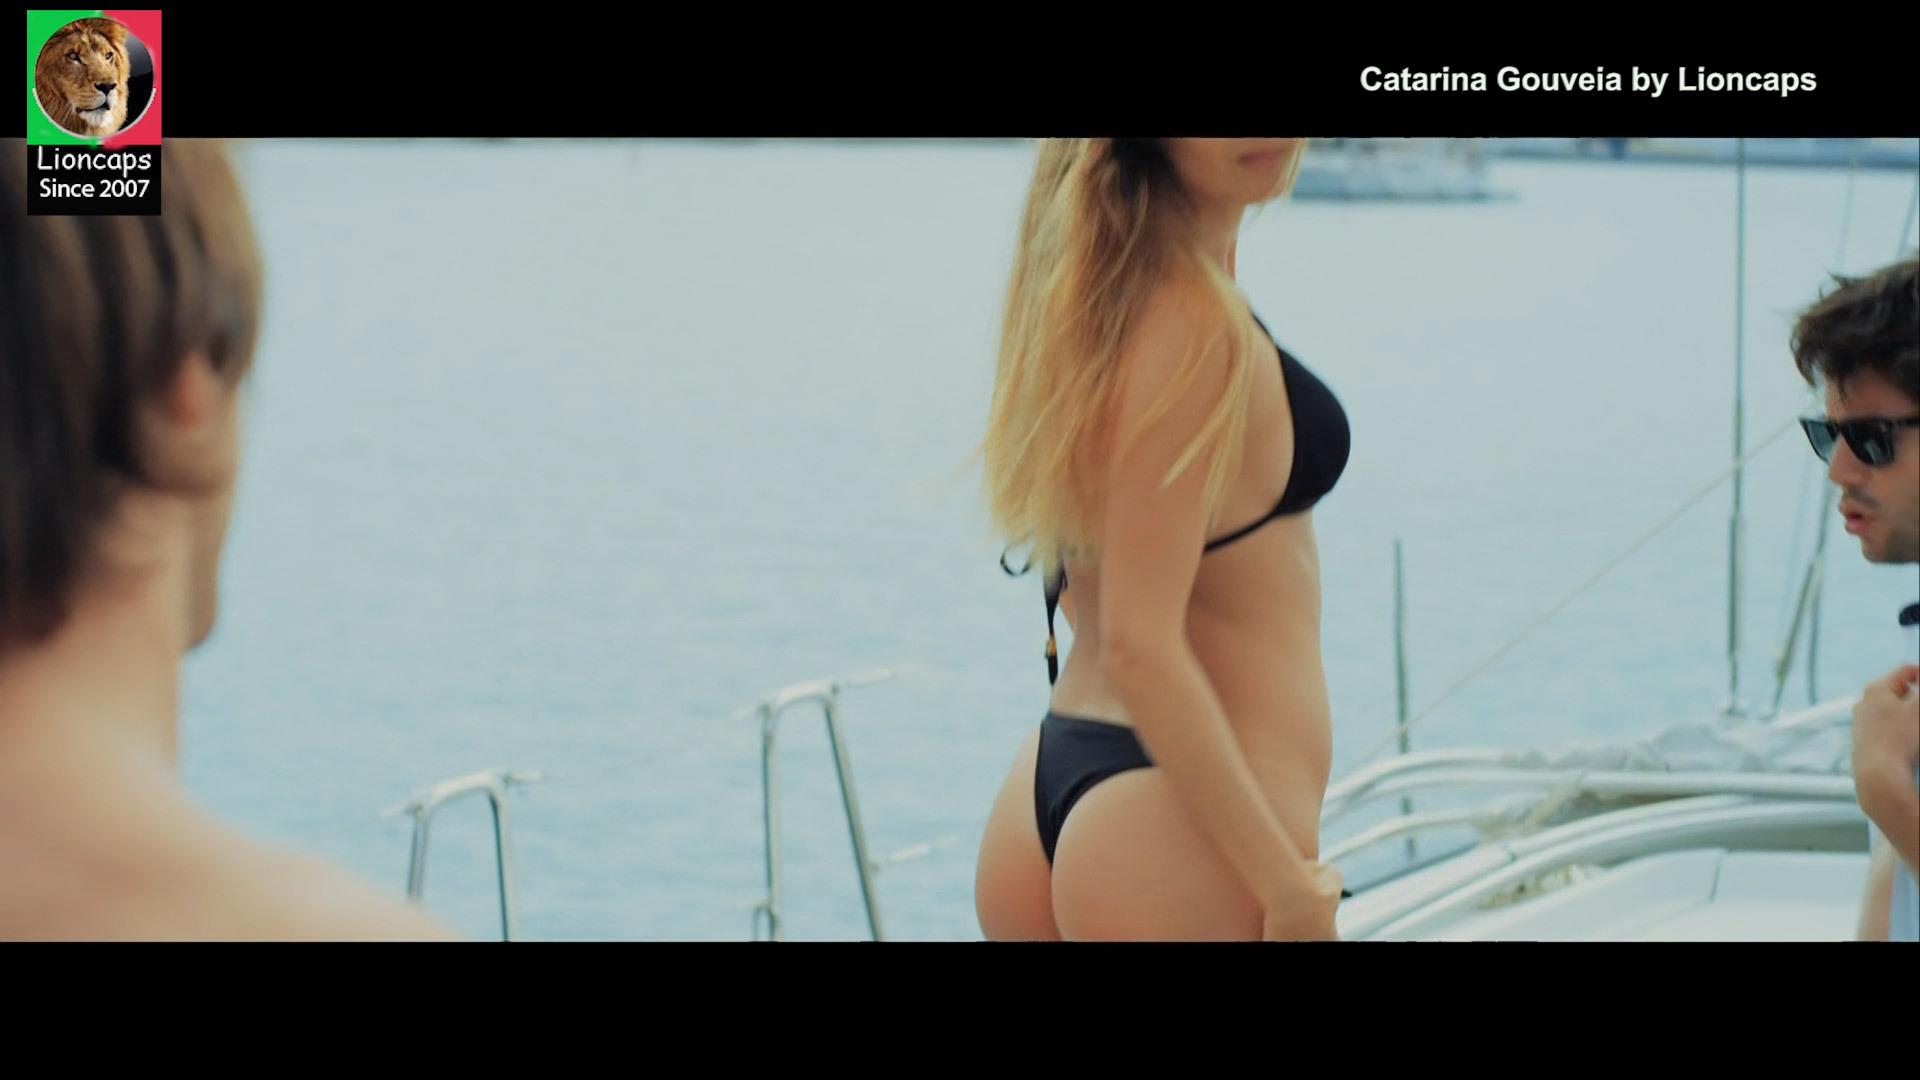 catarina_gouveia_perdidos_lioncaps_09_05_2021_07 (6).jpg